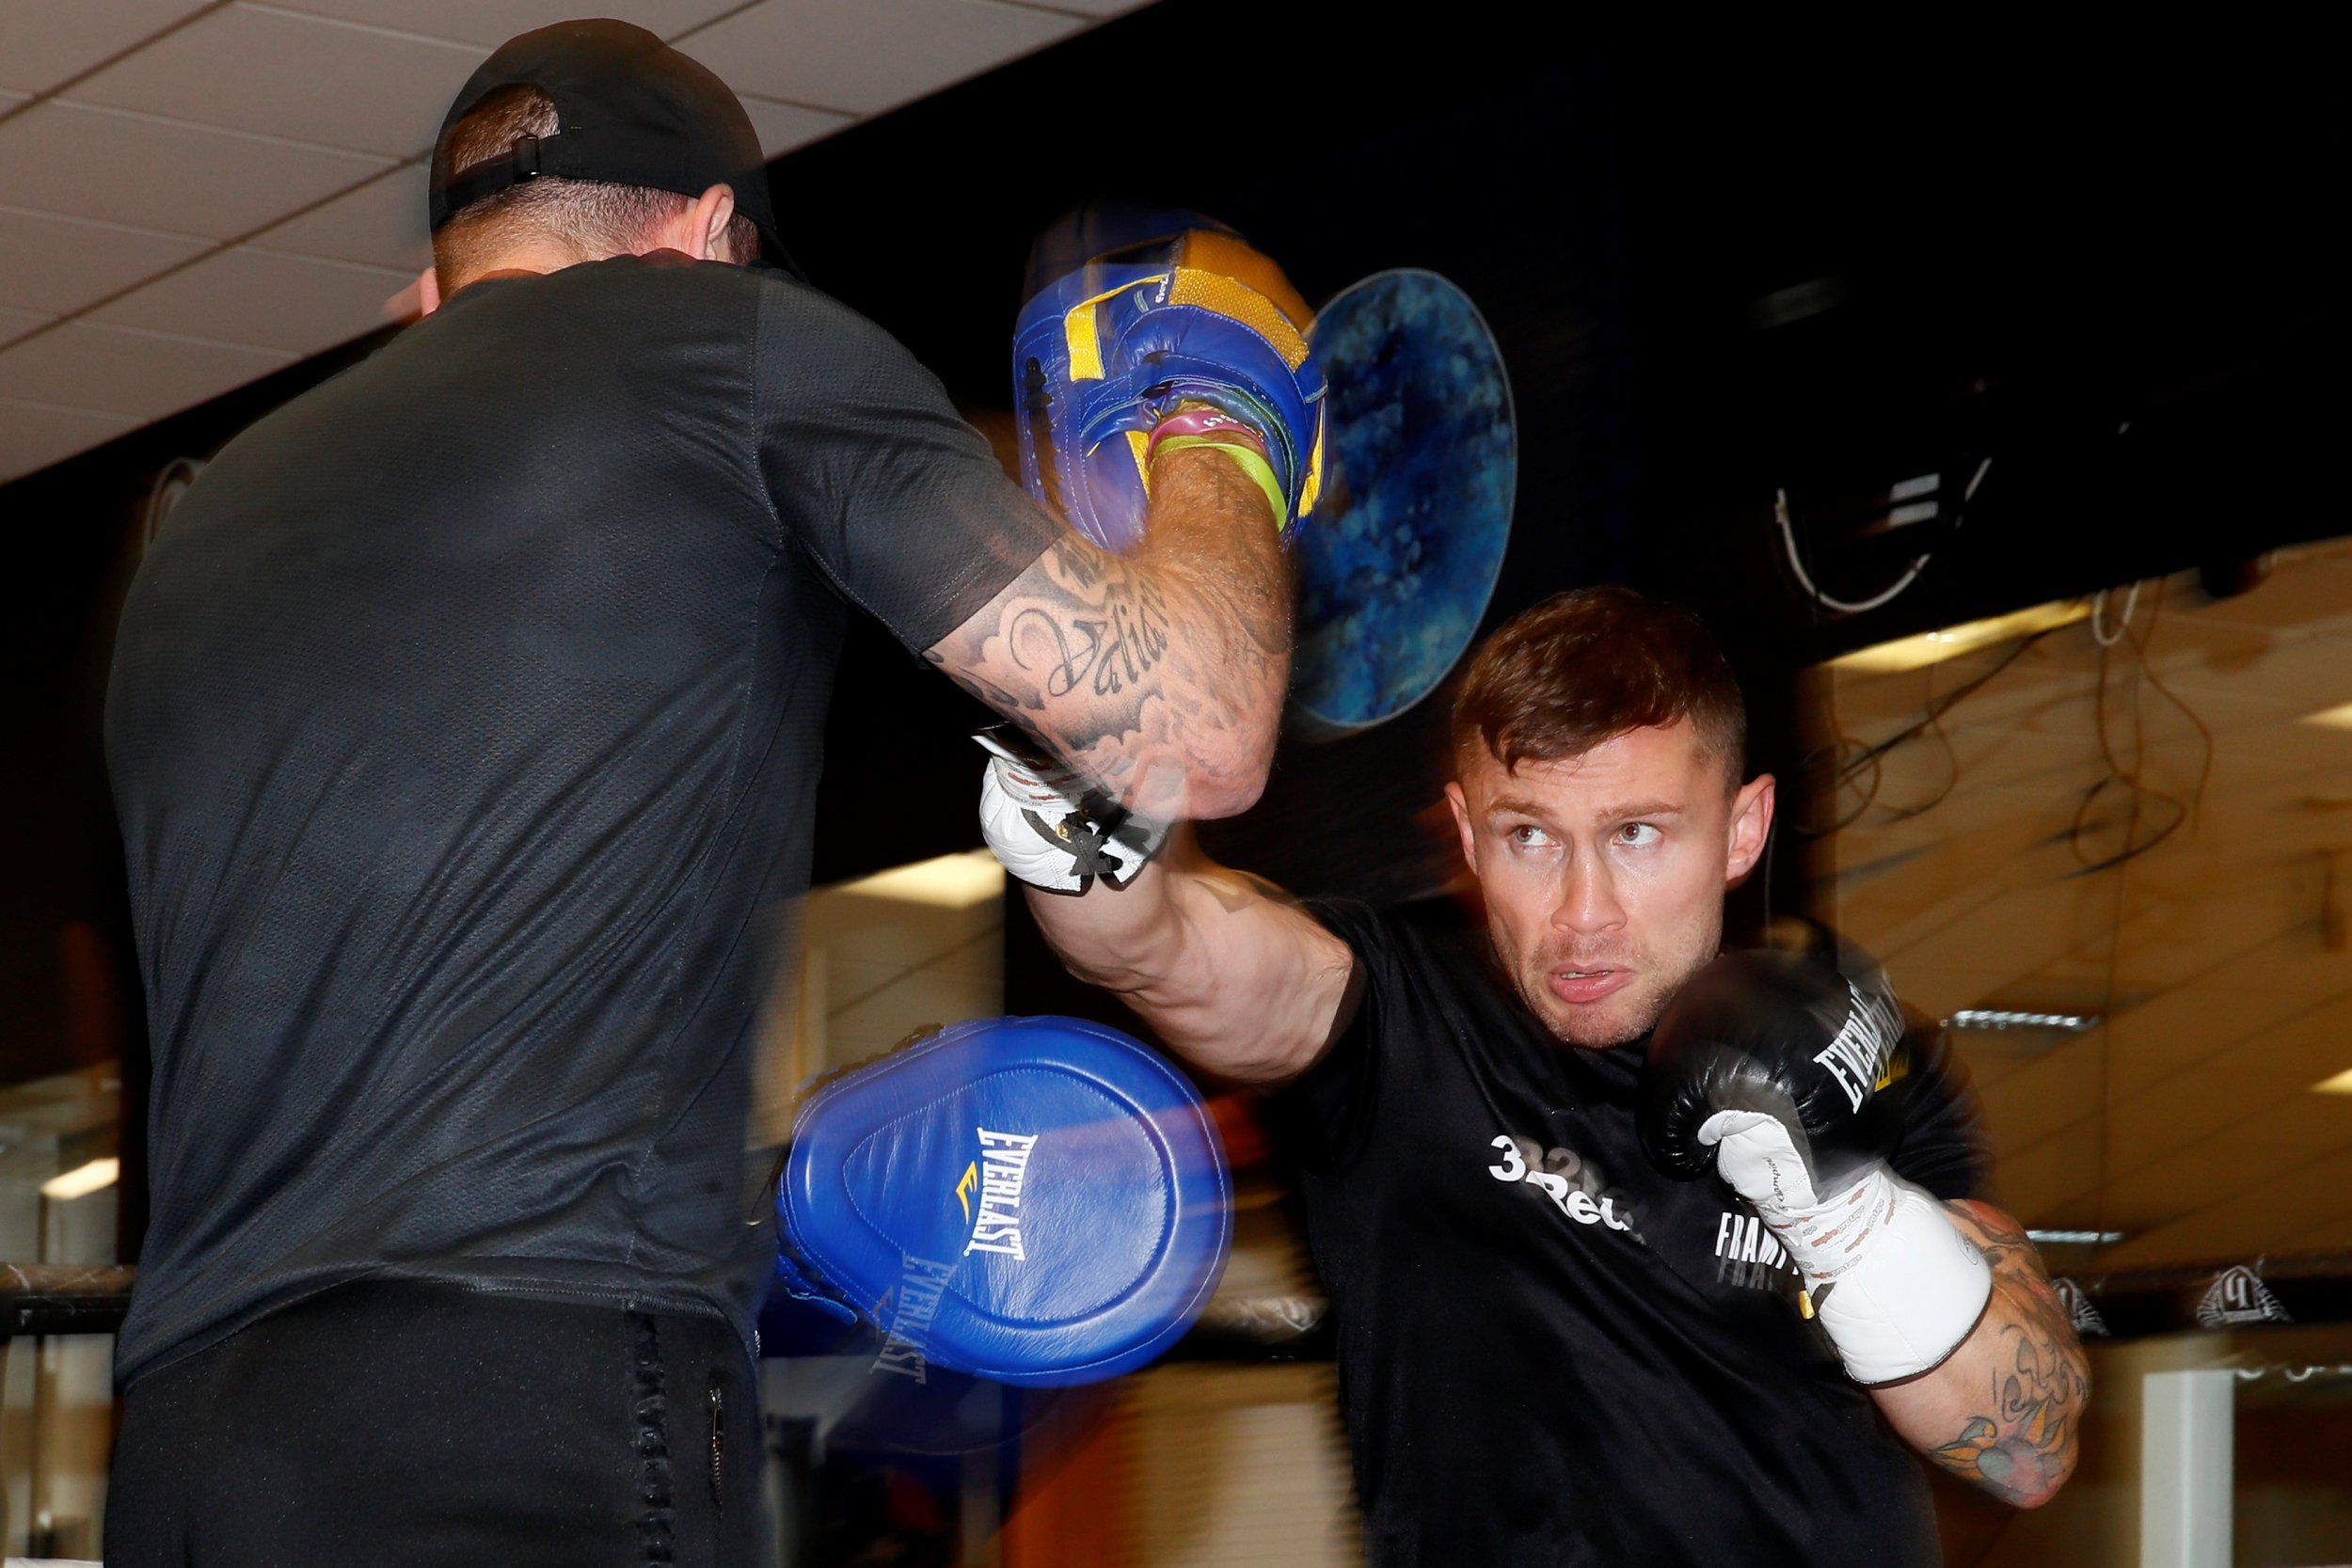 Boxing - Josh Warrington & Carl Frampton media work-outs - Hatton Health and Fitness, Hyde, Britain - November 12, 2018 Carl Frampton during his work out Action Images via Reuters/Jason Cairnduff